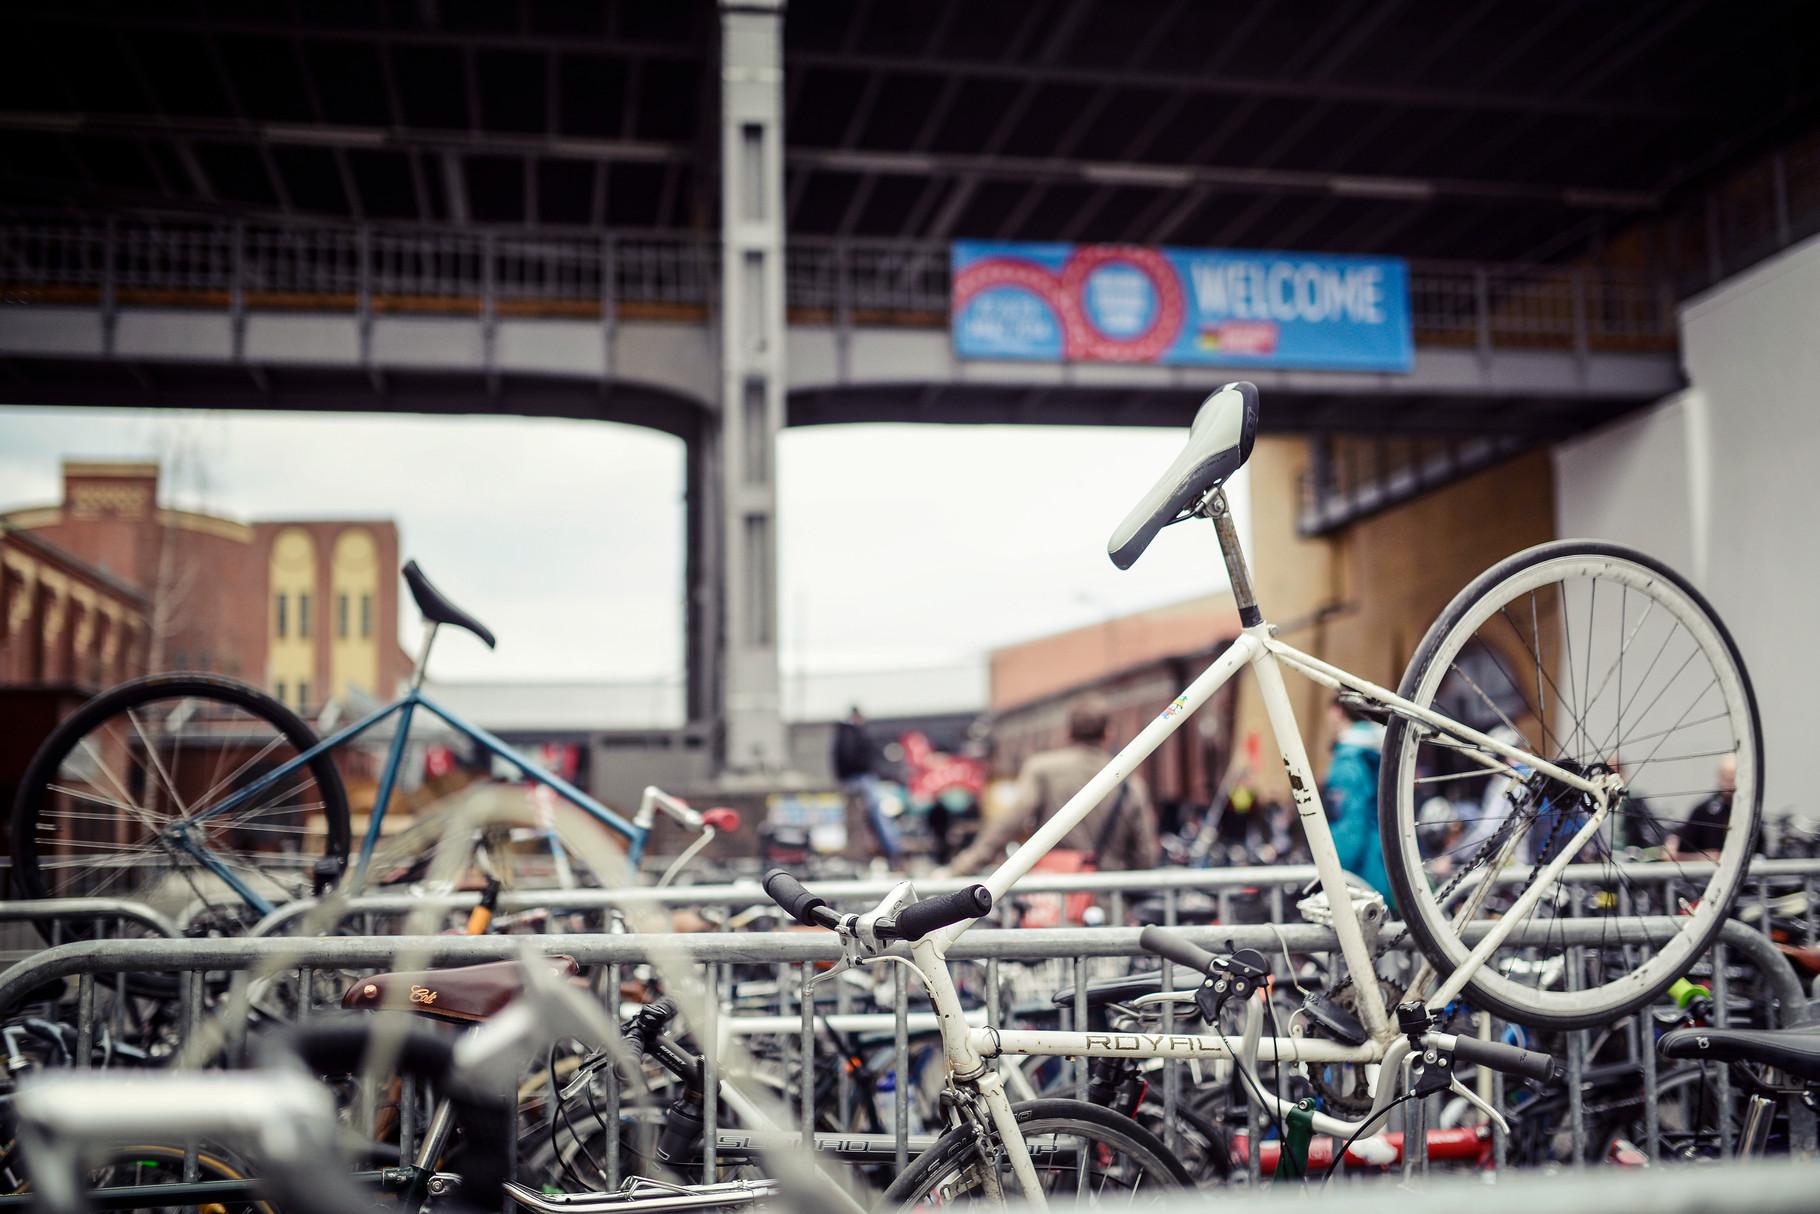 © Berliner Fahrradschau